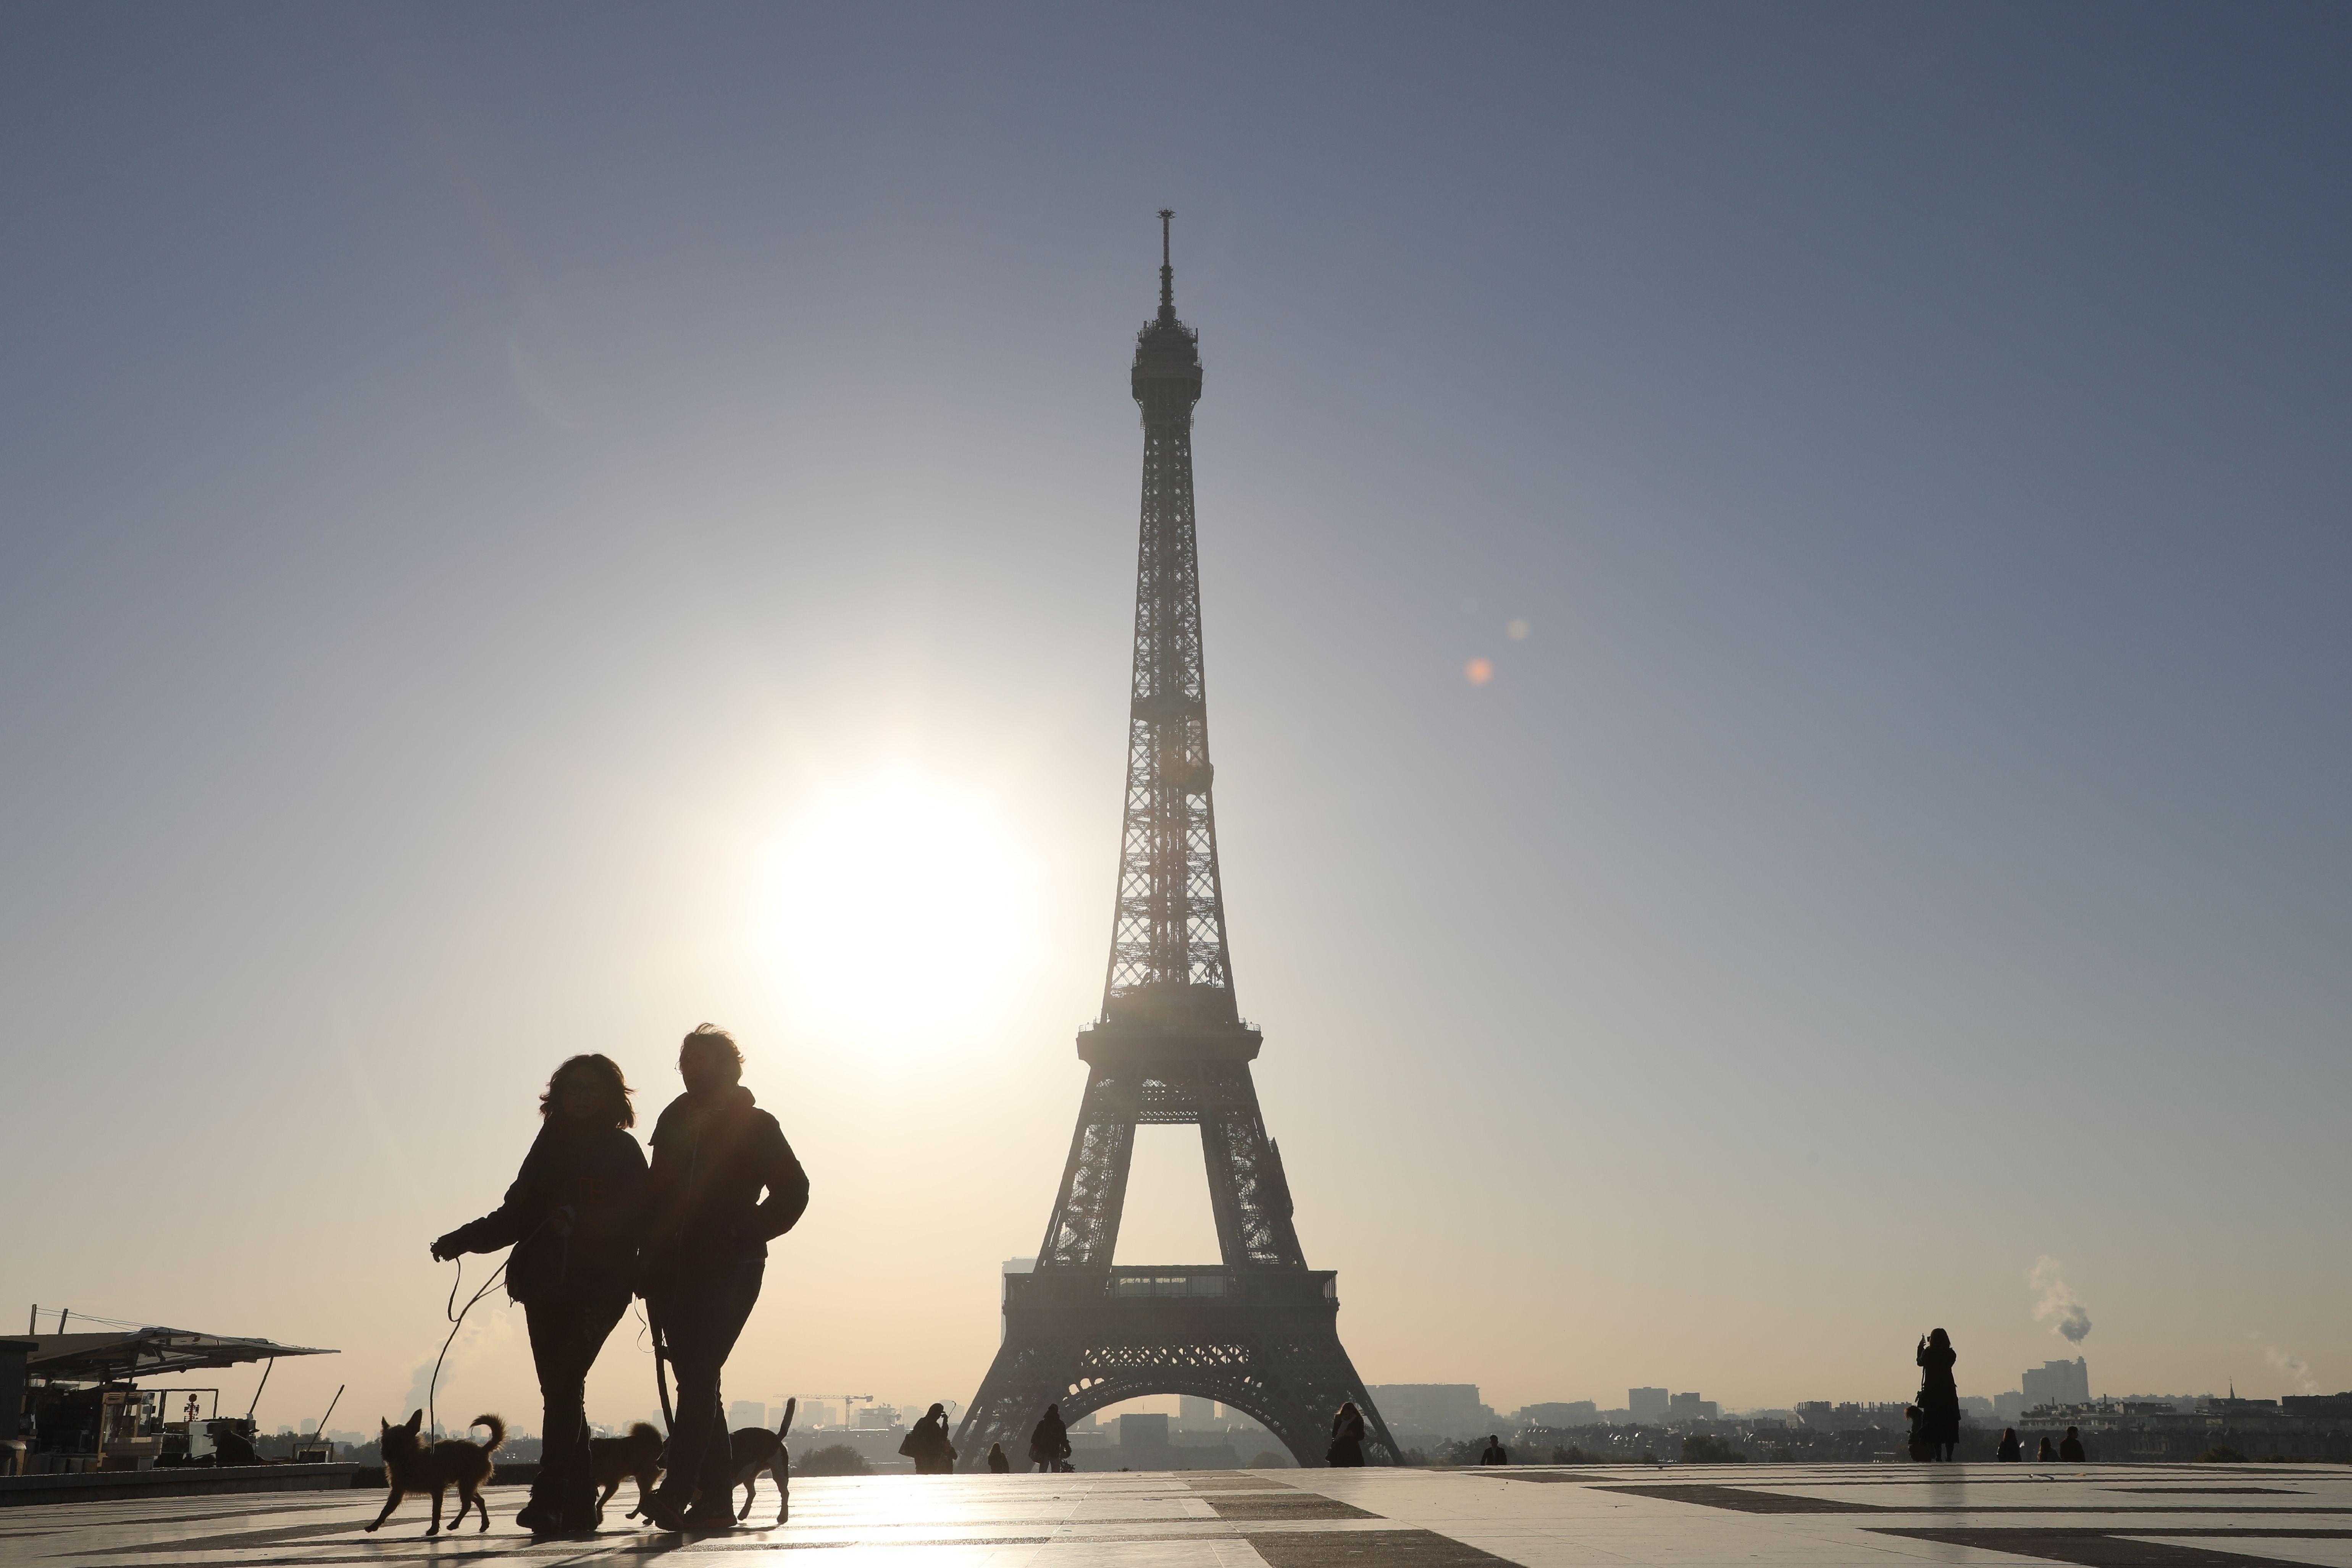 FRANCE-LIFESTYLE-LEISURE-TOURISM-FEATURE